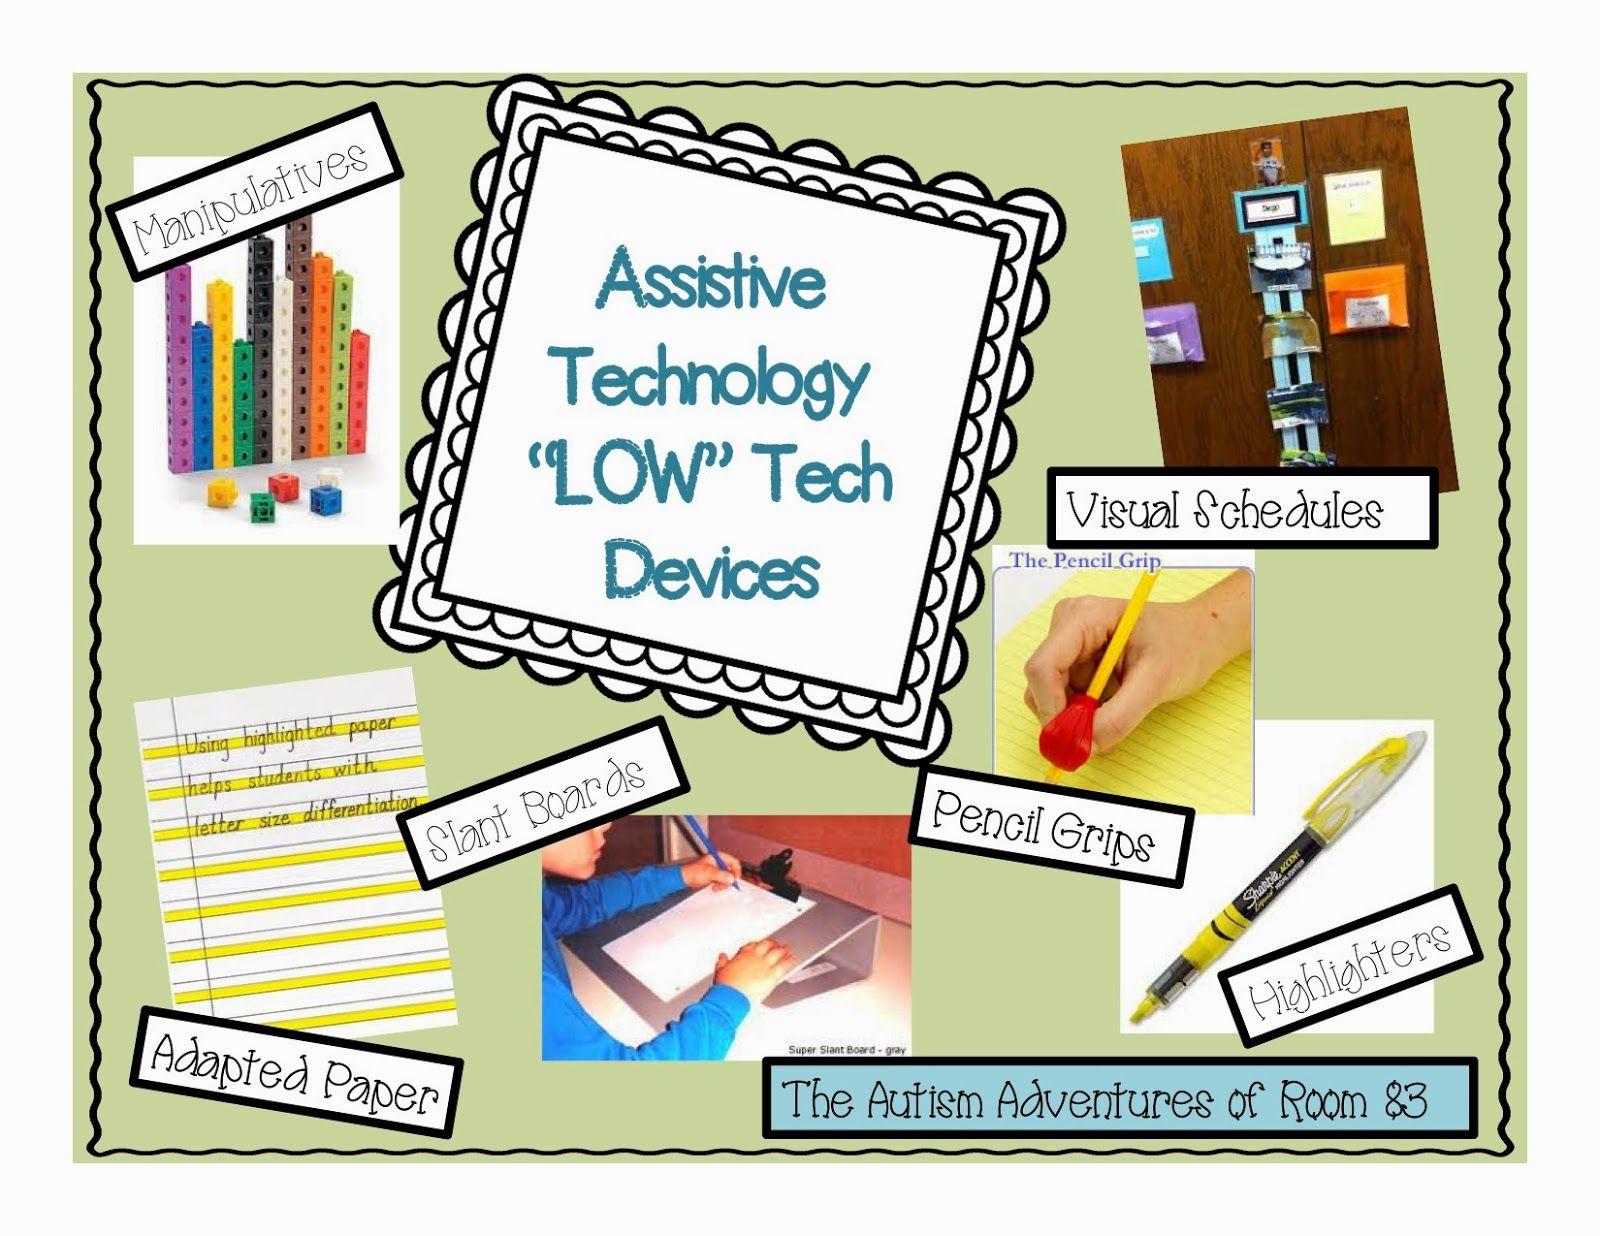 High Tech Vs Low Tech Aac Devices